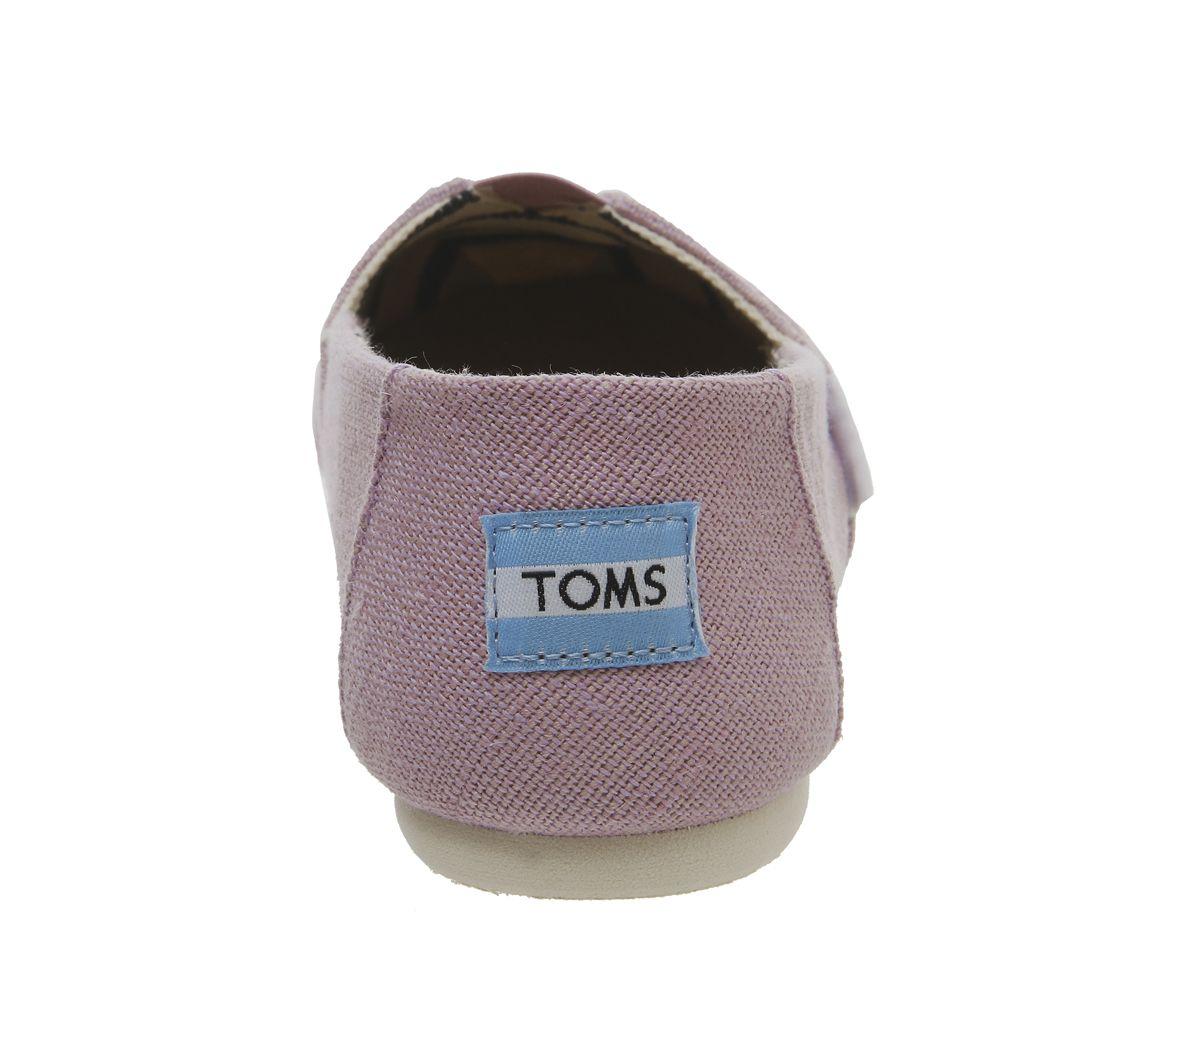 Womens-Toms-Seasonal-Classic-Slip-On-Flats-Soft-Lilac-Flats thumbnail 11